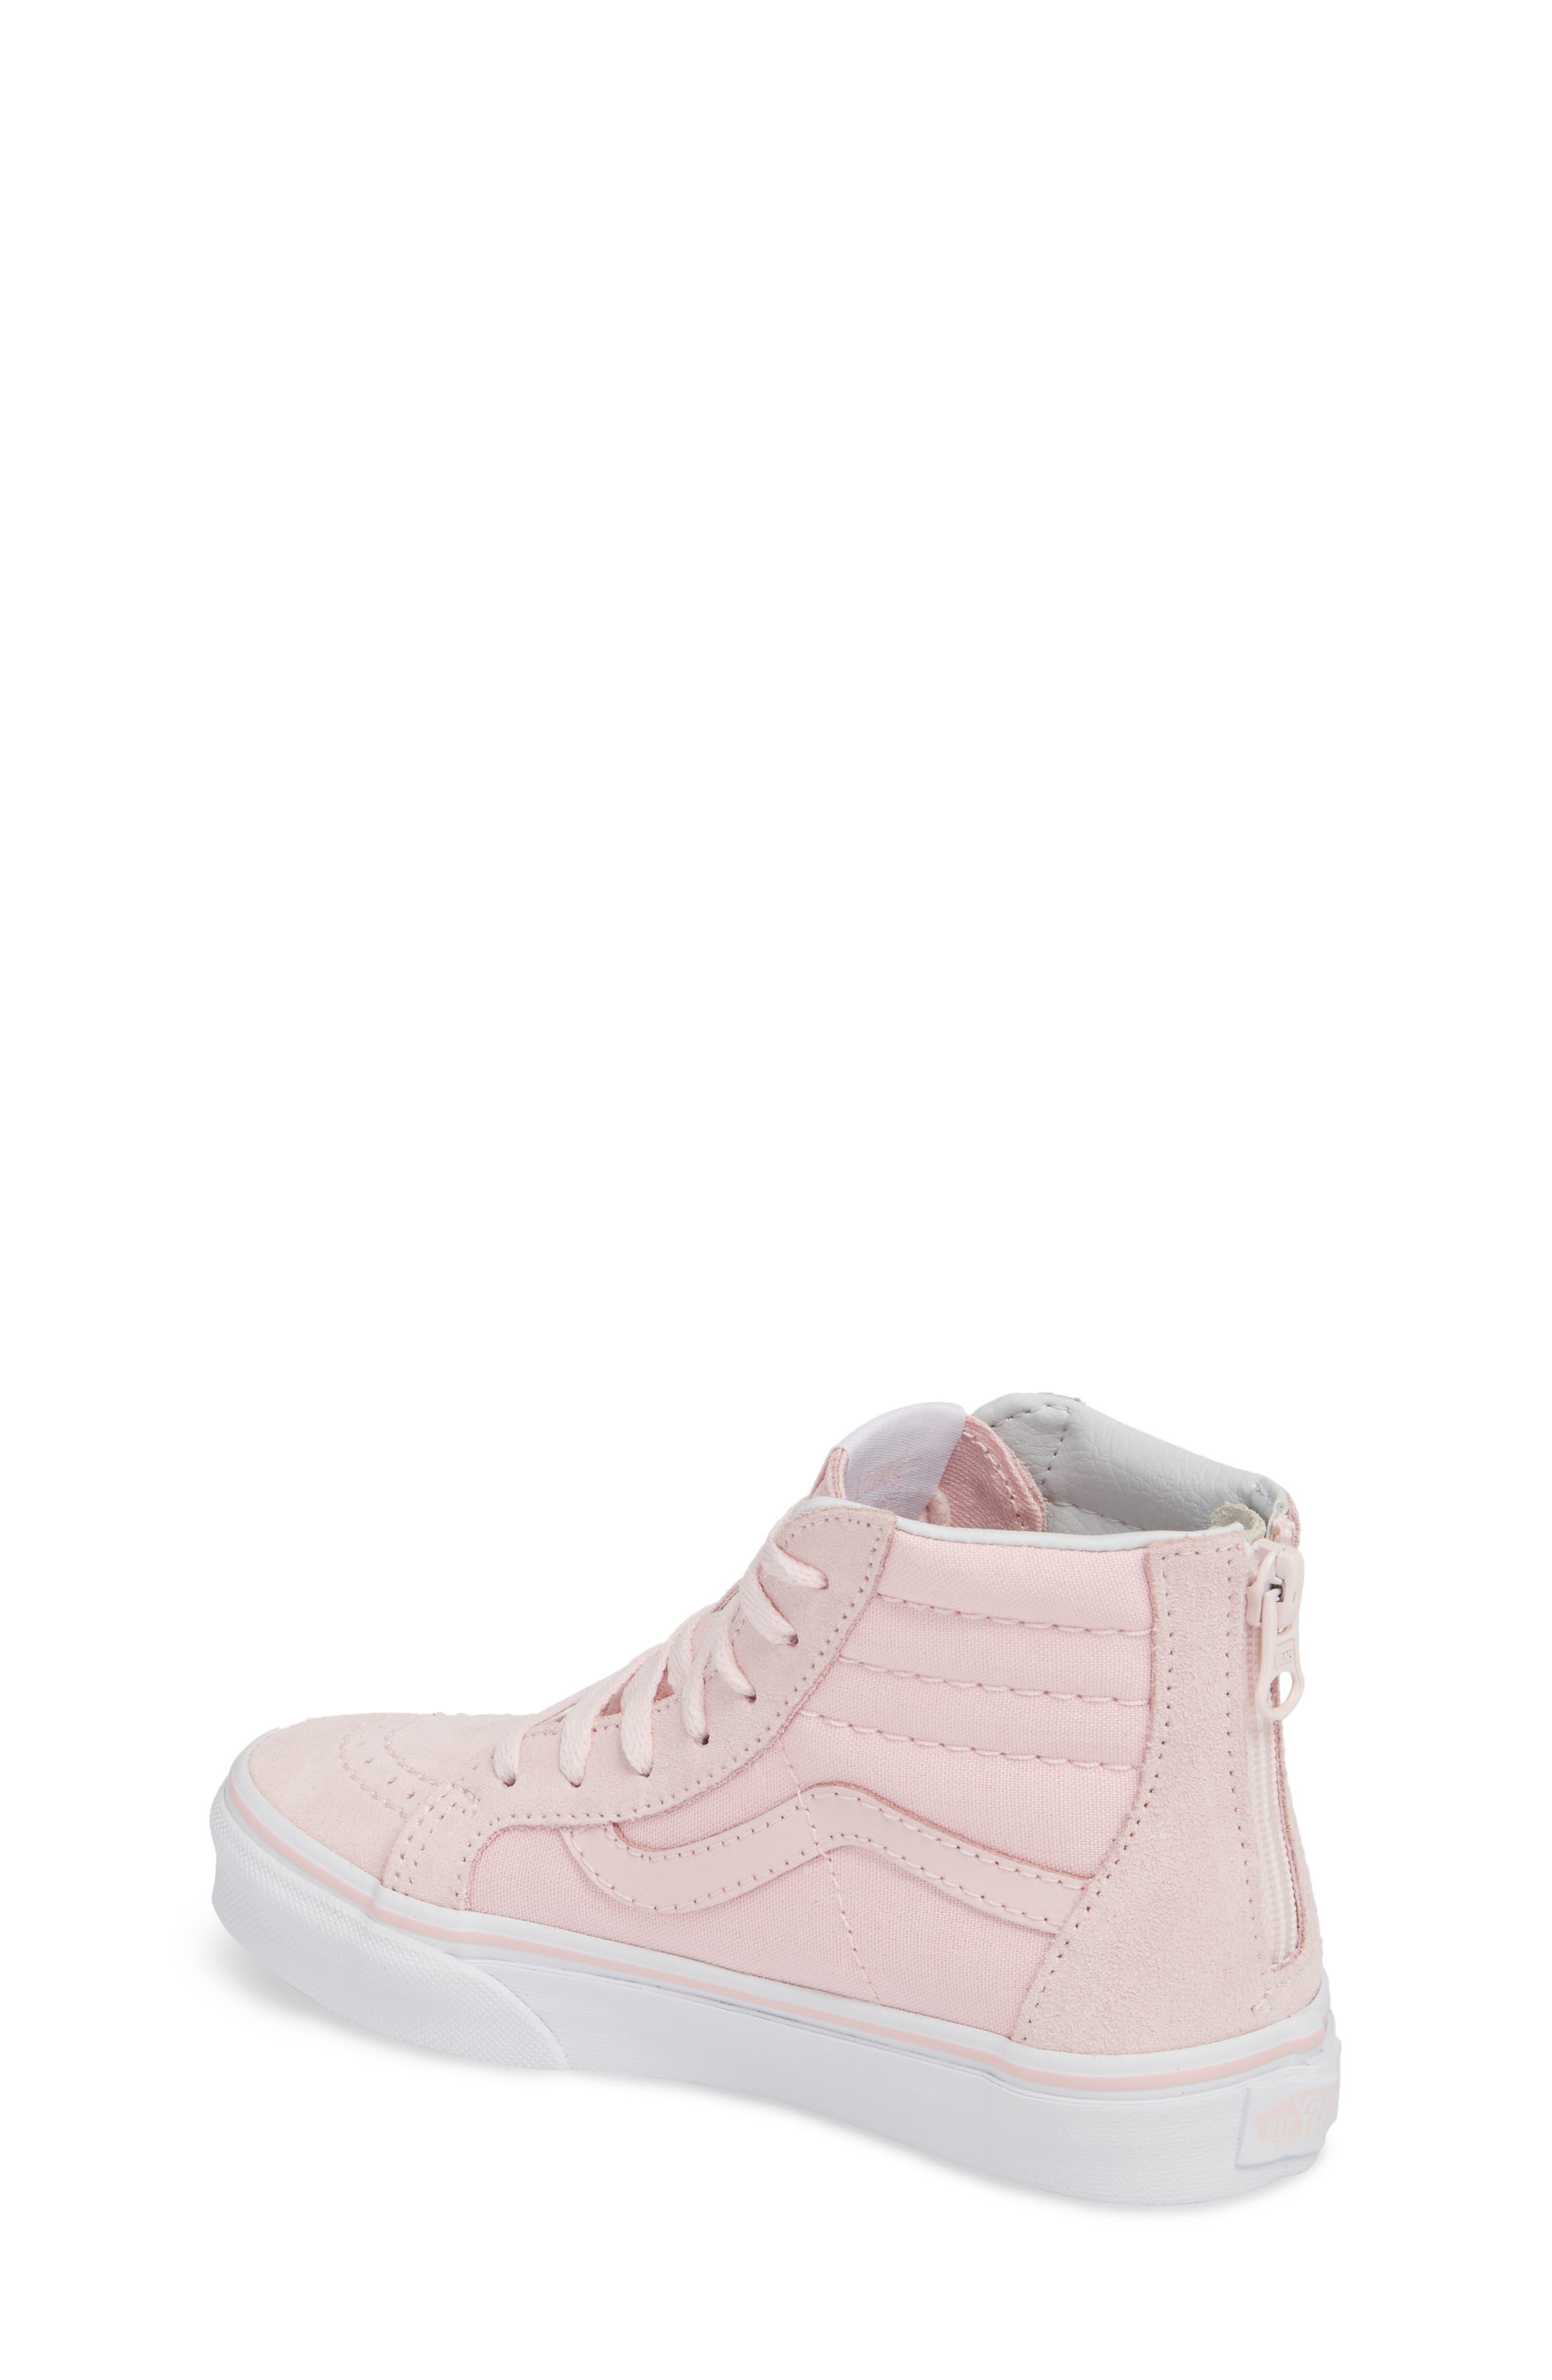 Sk8-Hi Zip Sneaker,                             Alternate thumbnail 2, color,                             CHALK PINK/ TRUE WHITE